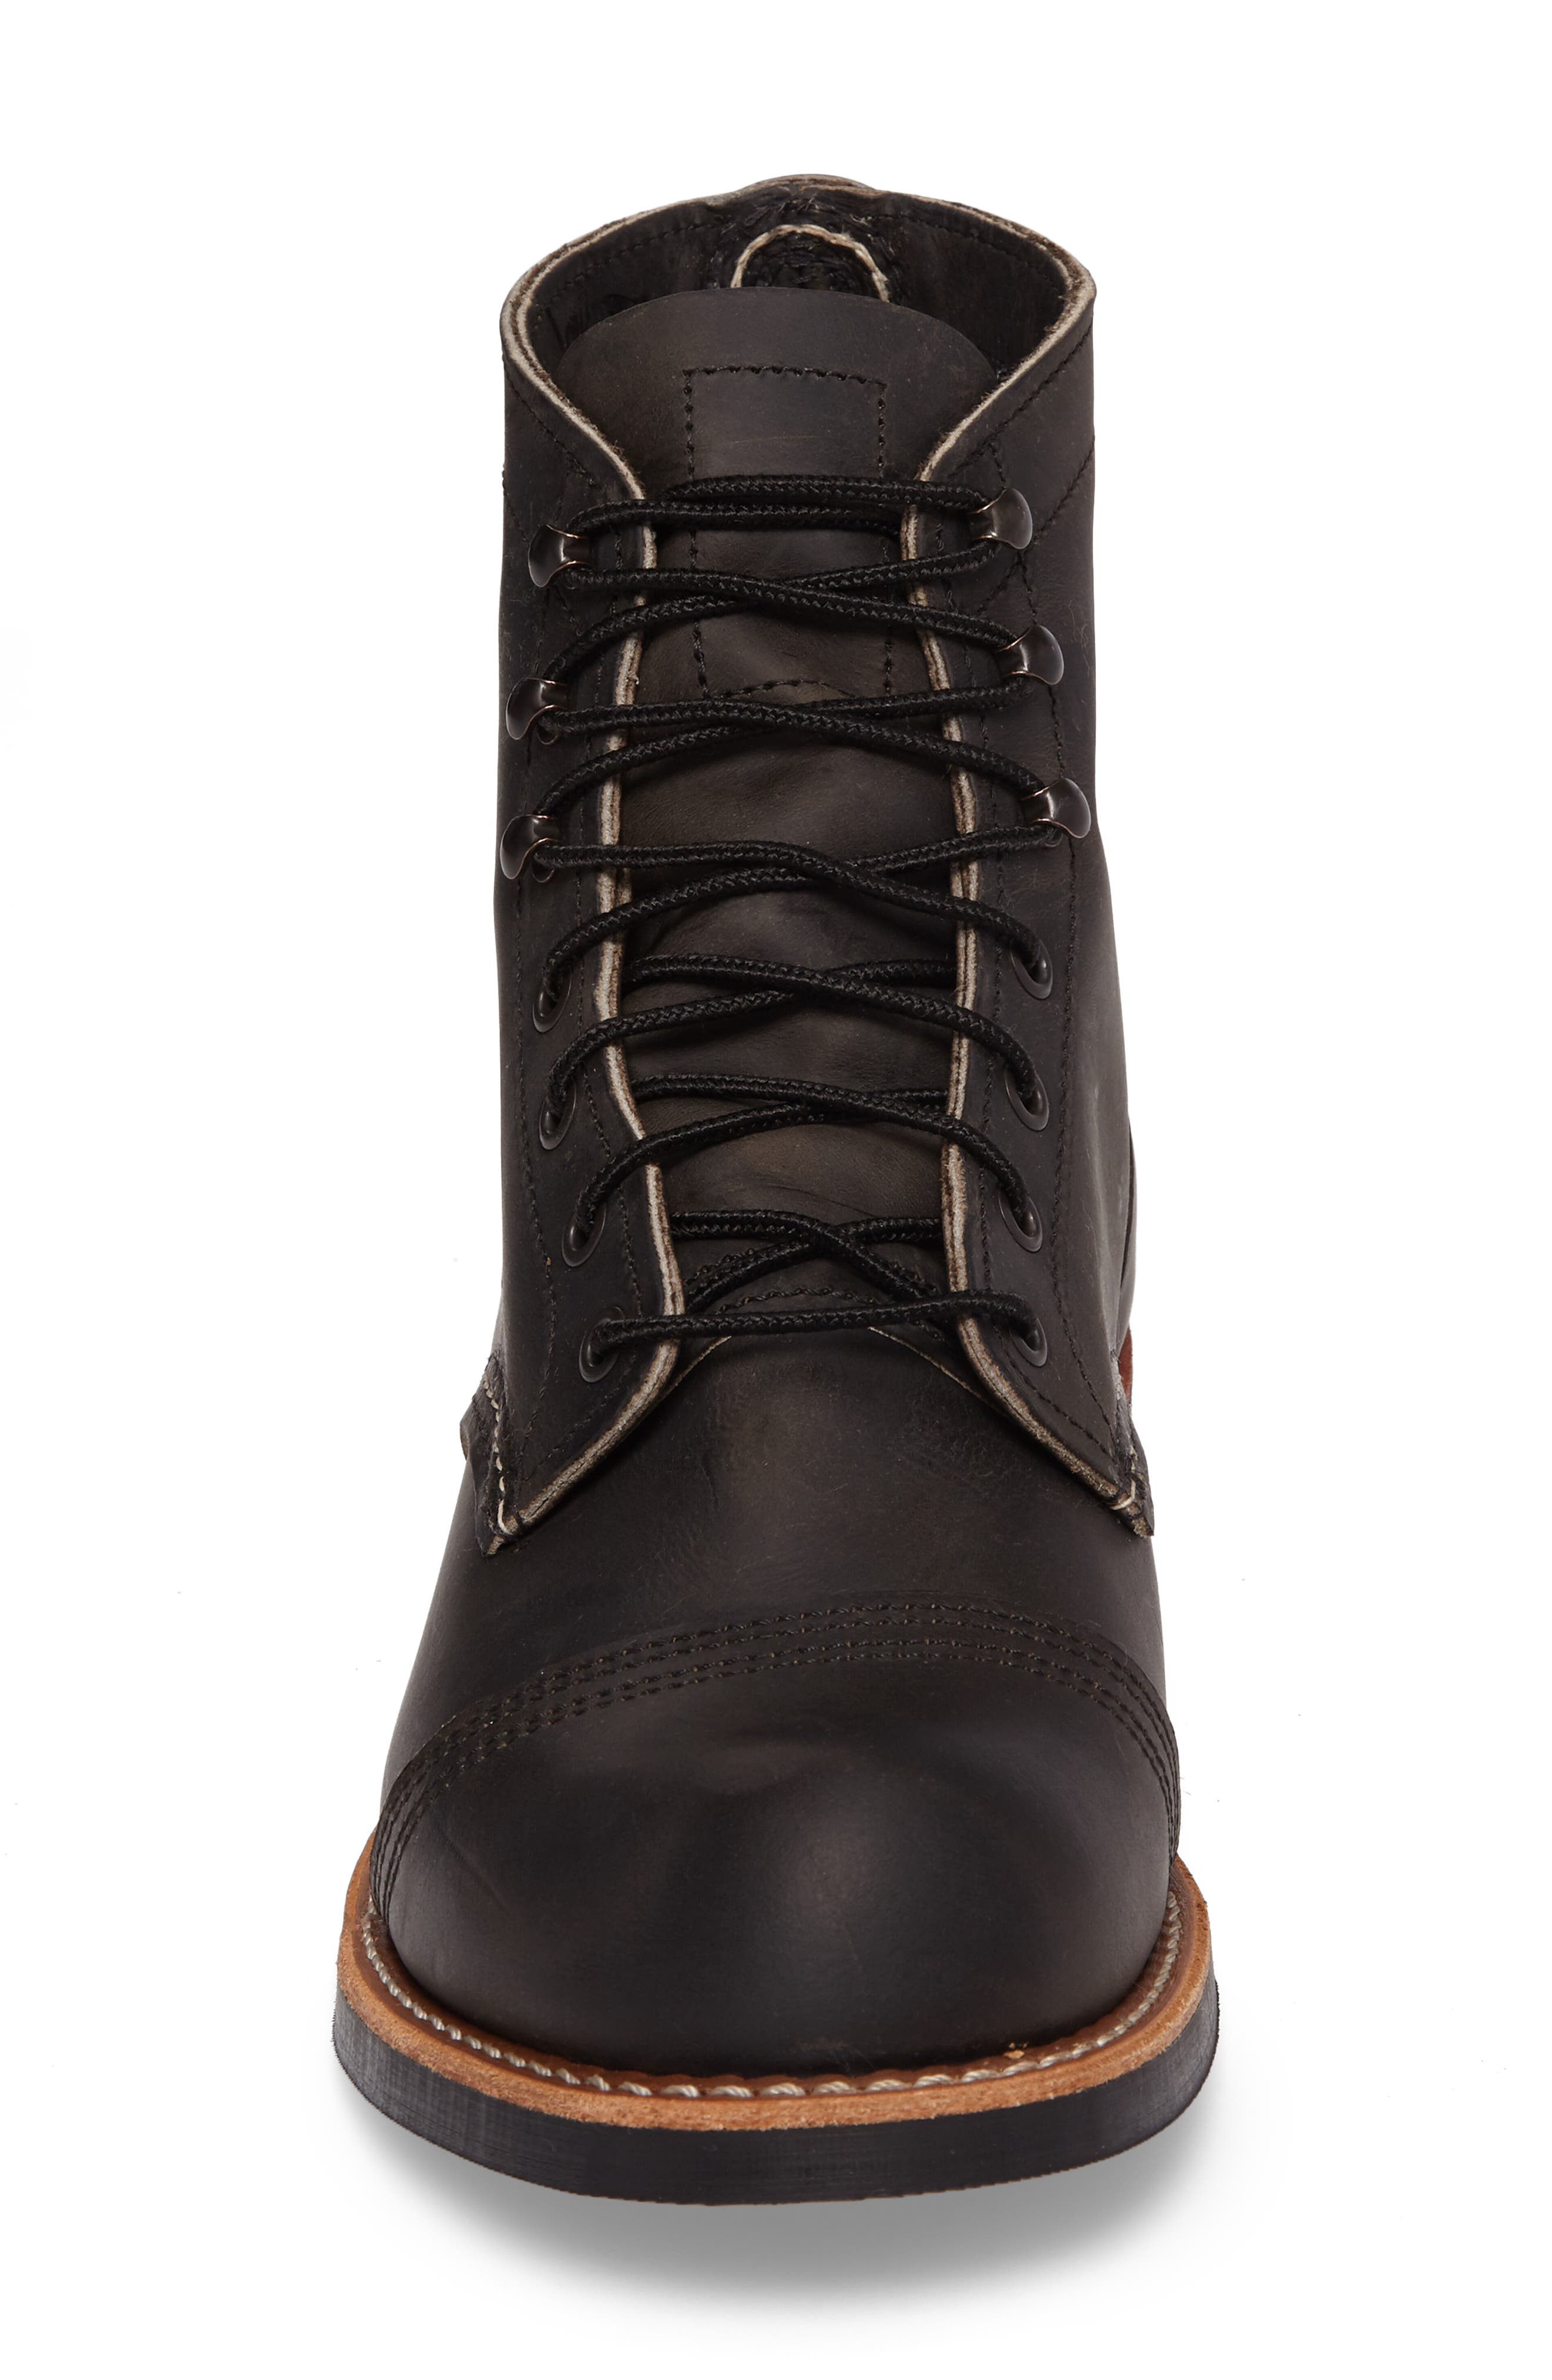 Iron Ranger Cap Toe Boot,                             Alternate thumbnail 4, color,                             CHARCOAL LEATHER